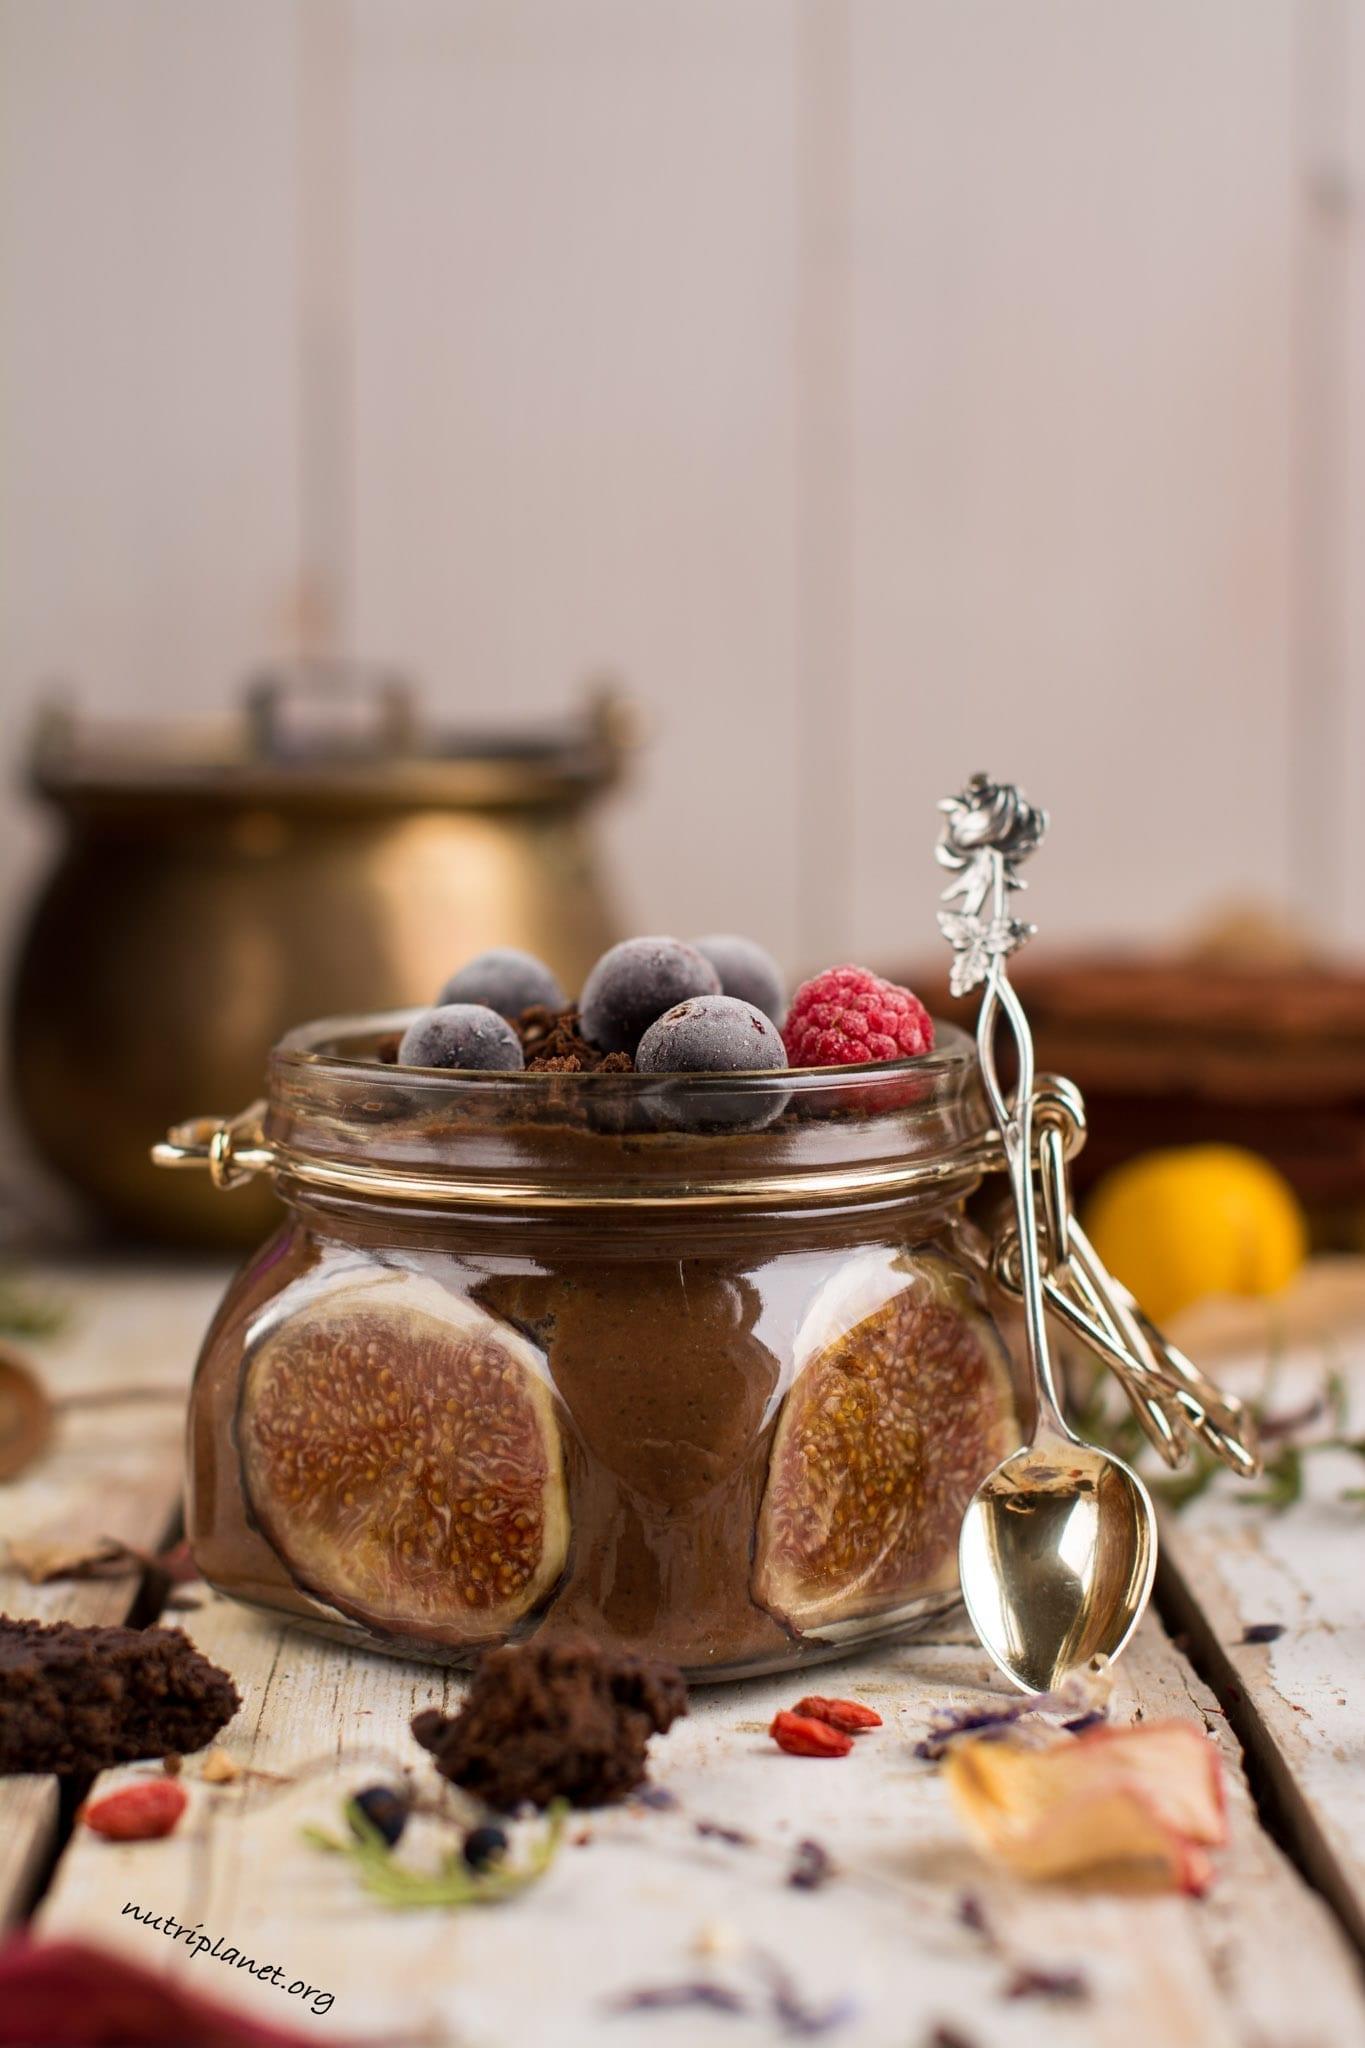 Vegan Chocolate Mousse Recipe with Cauliflower